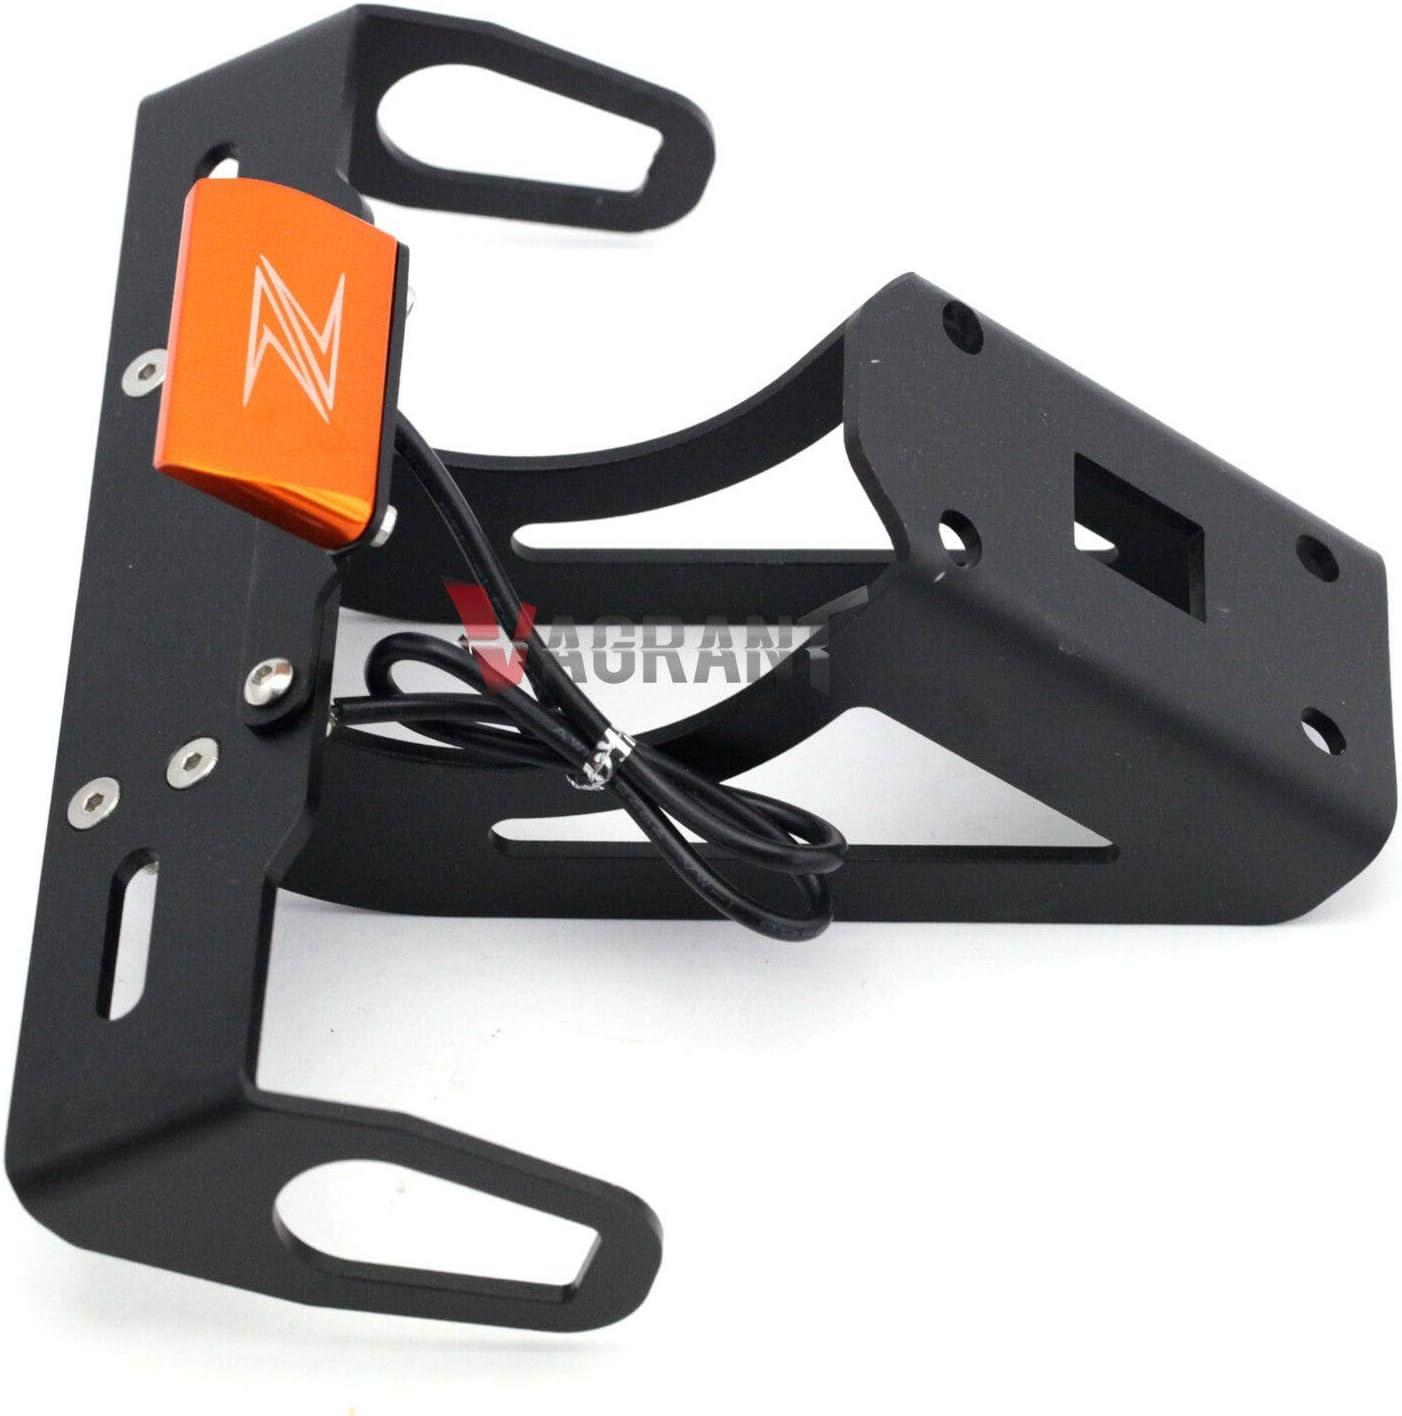 FidgetGear Kit de d/émontage de Garde-Boue arri/ère pour Kawasaki Ninja 1000,Z1000SX,Z1000 2010-2013